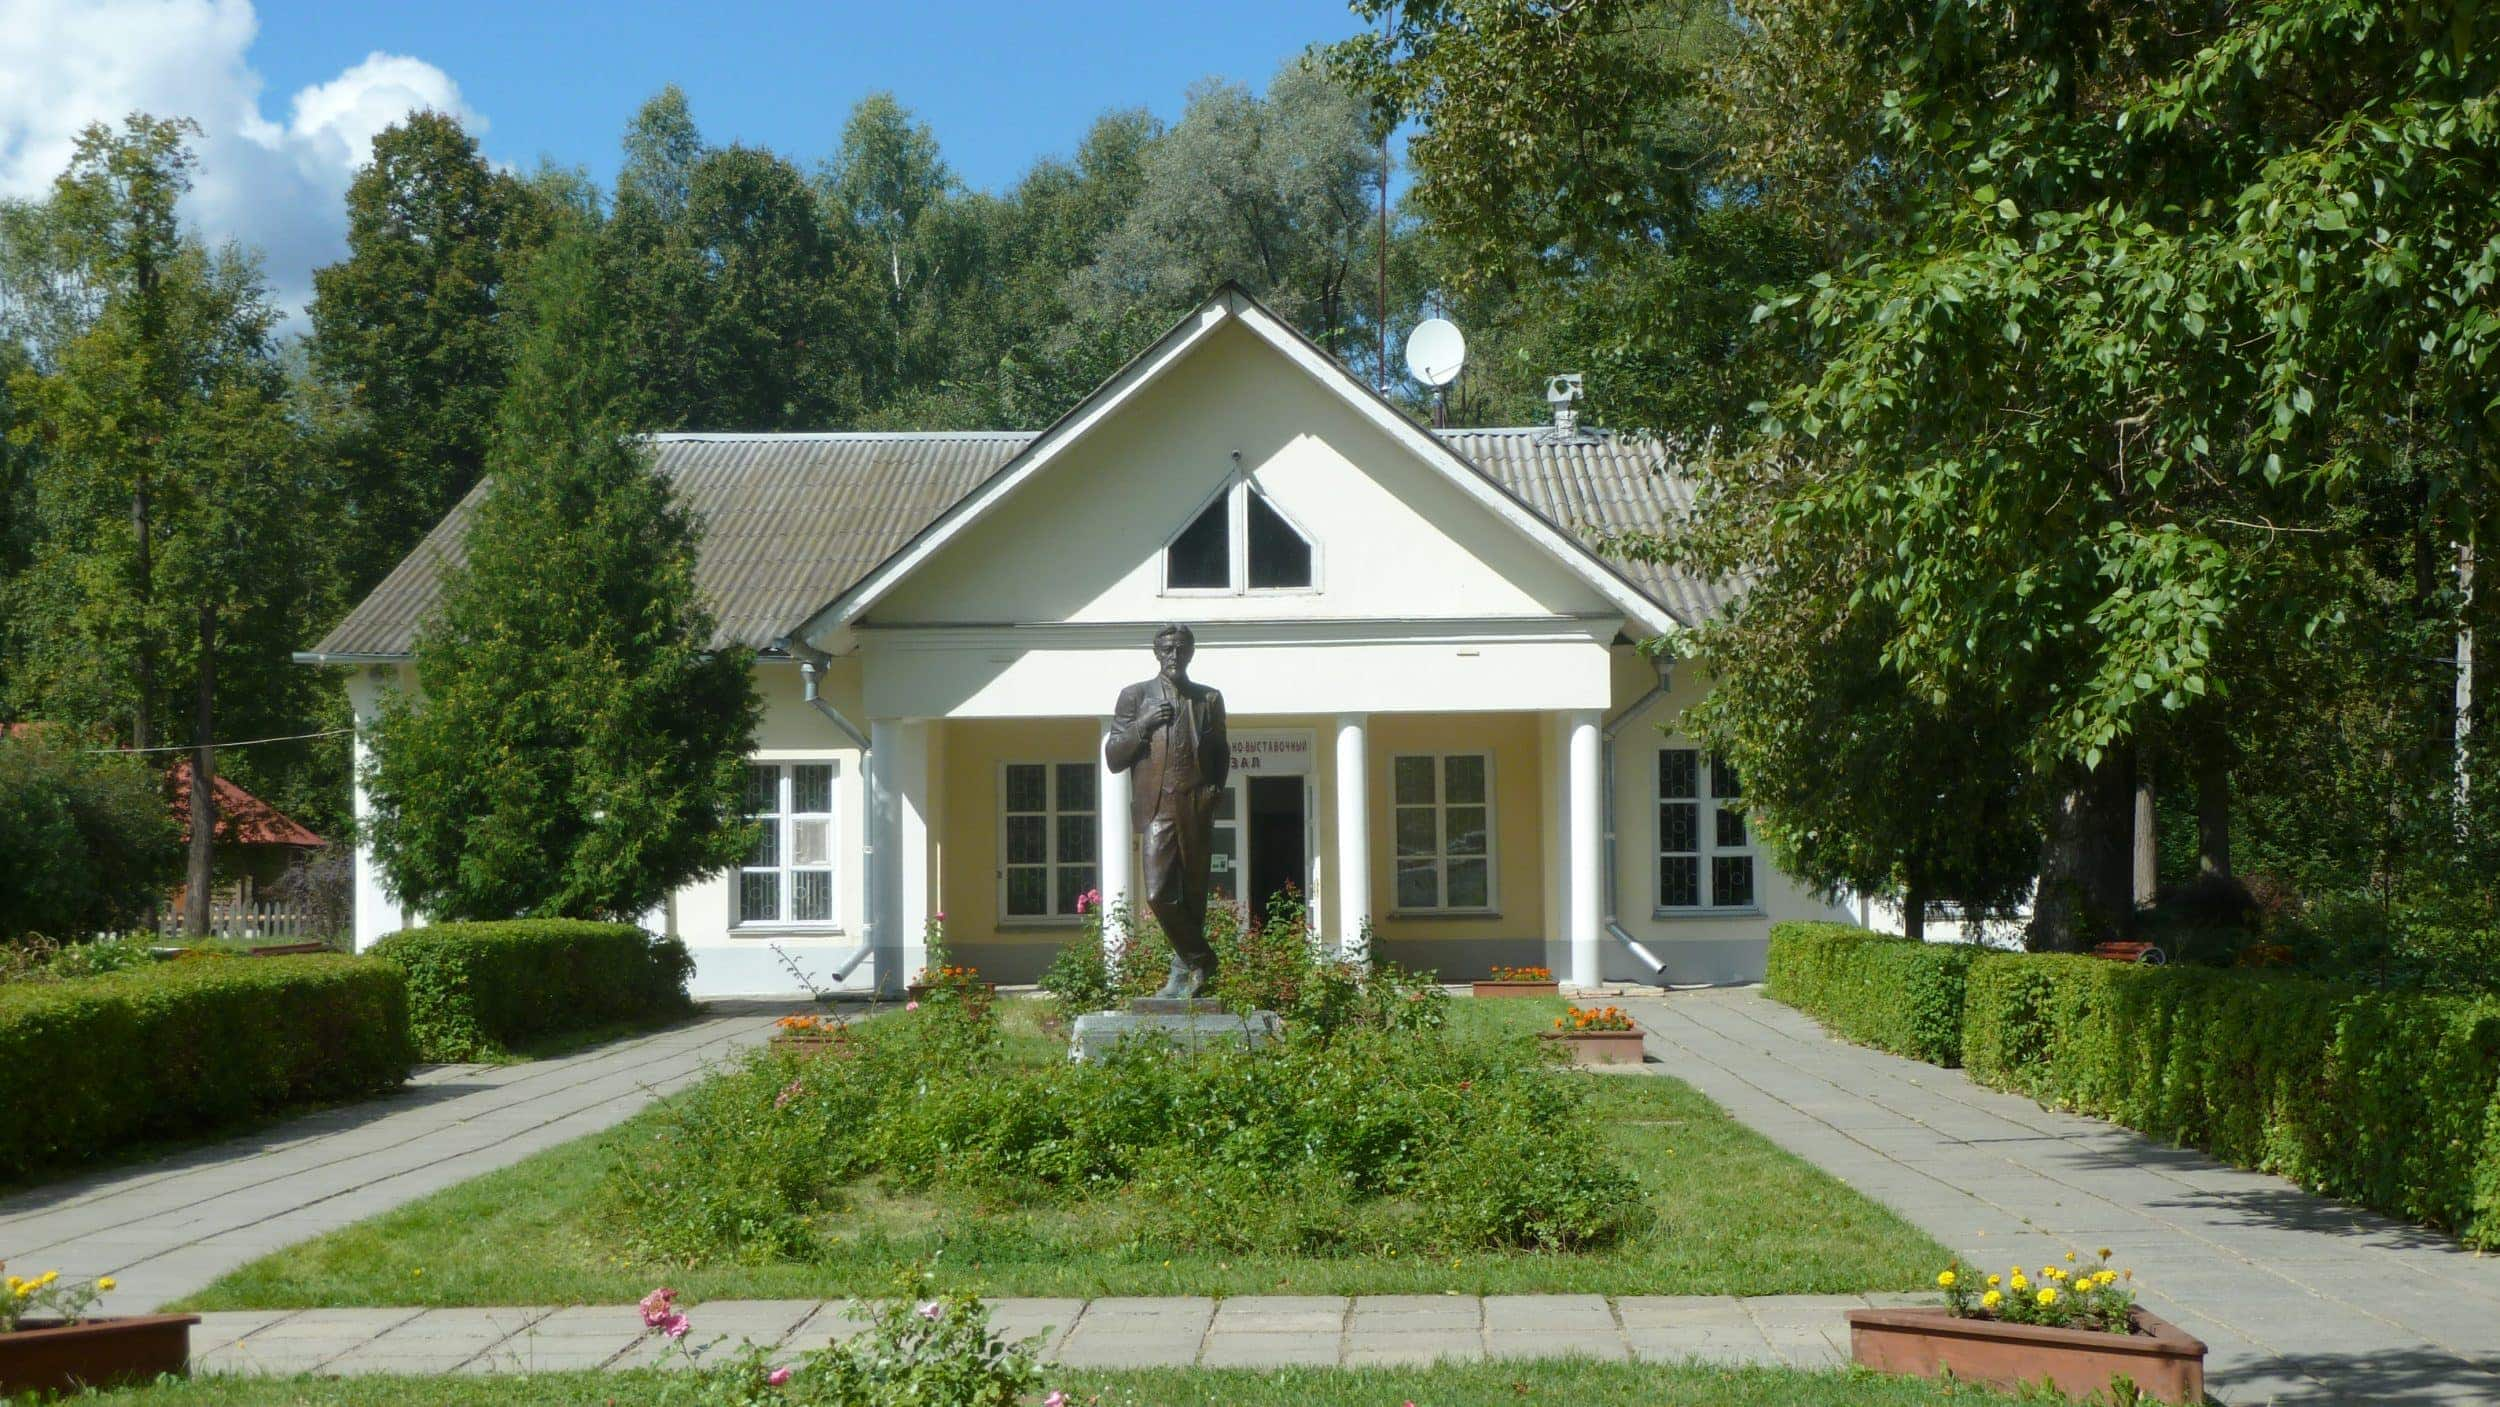 Музей-усадьба А. П. Чехова в Мелихово